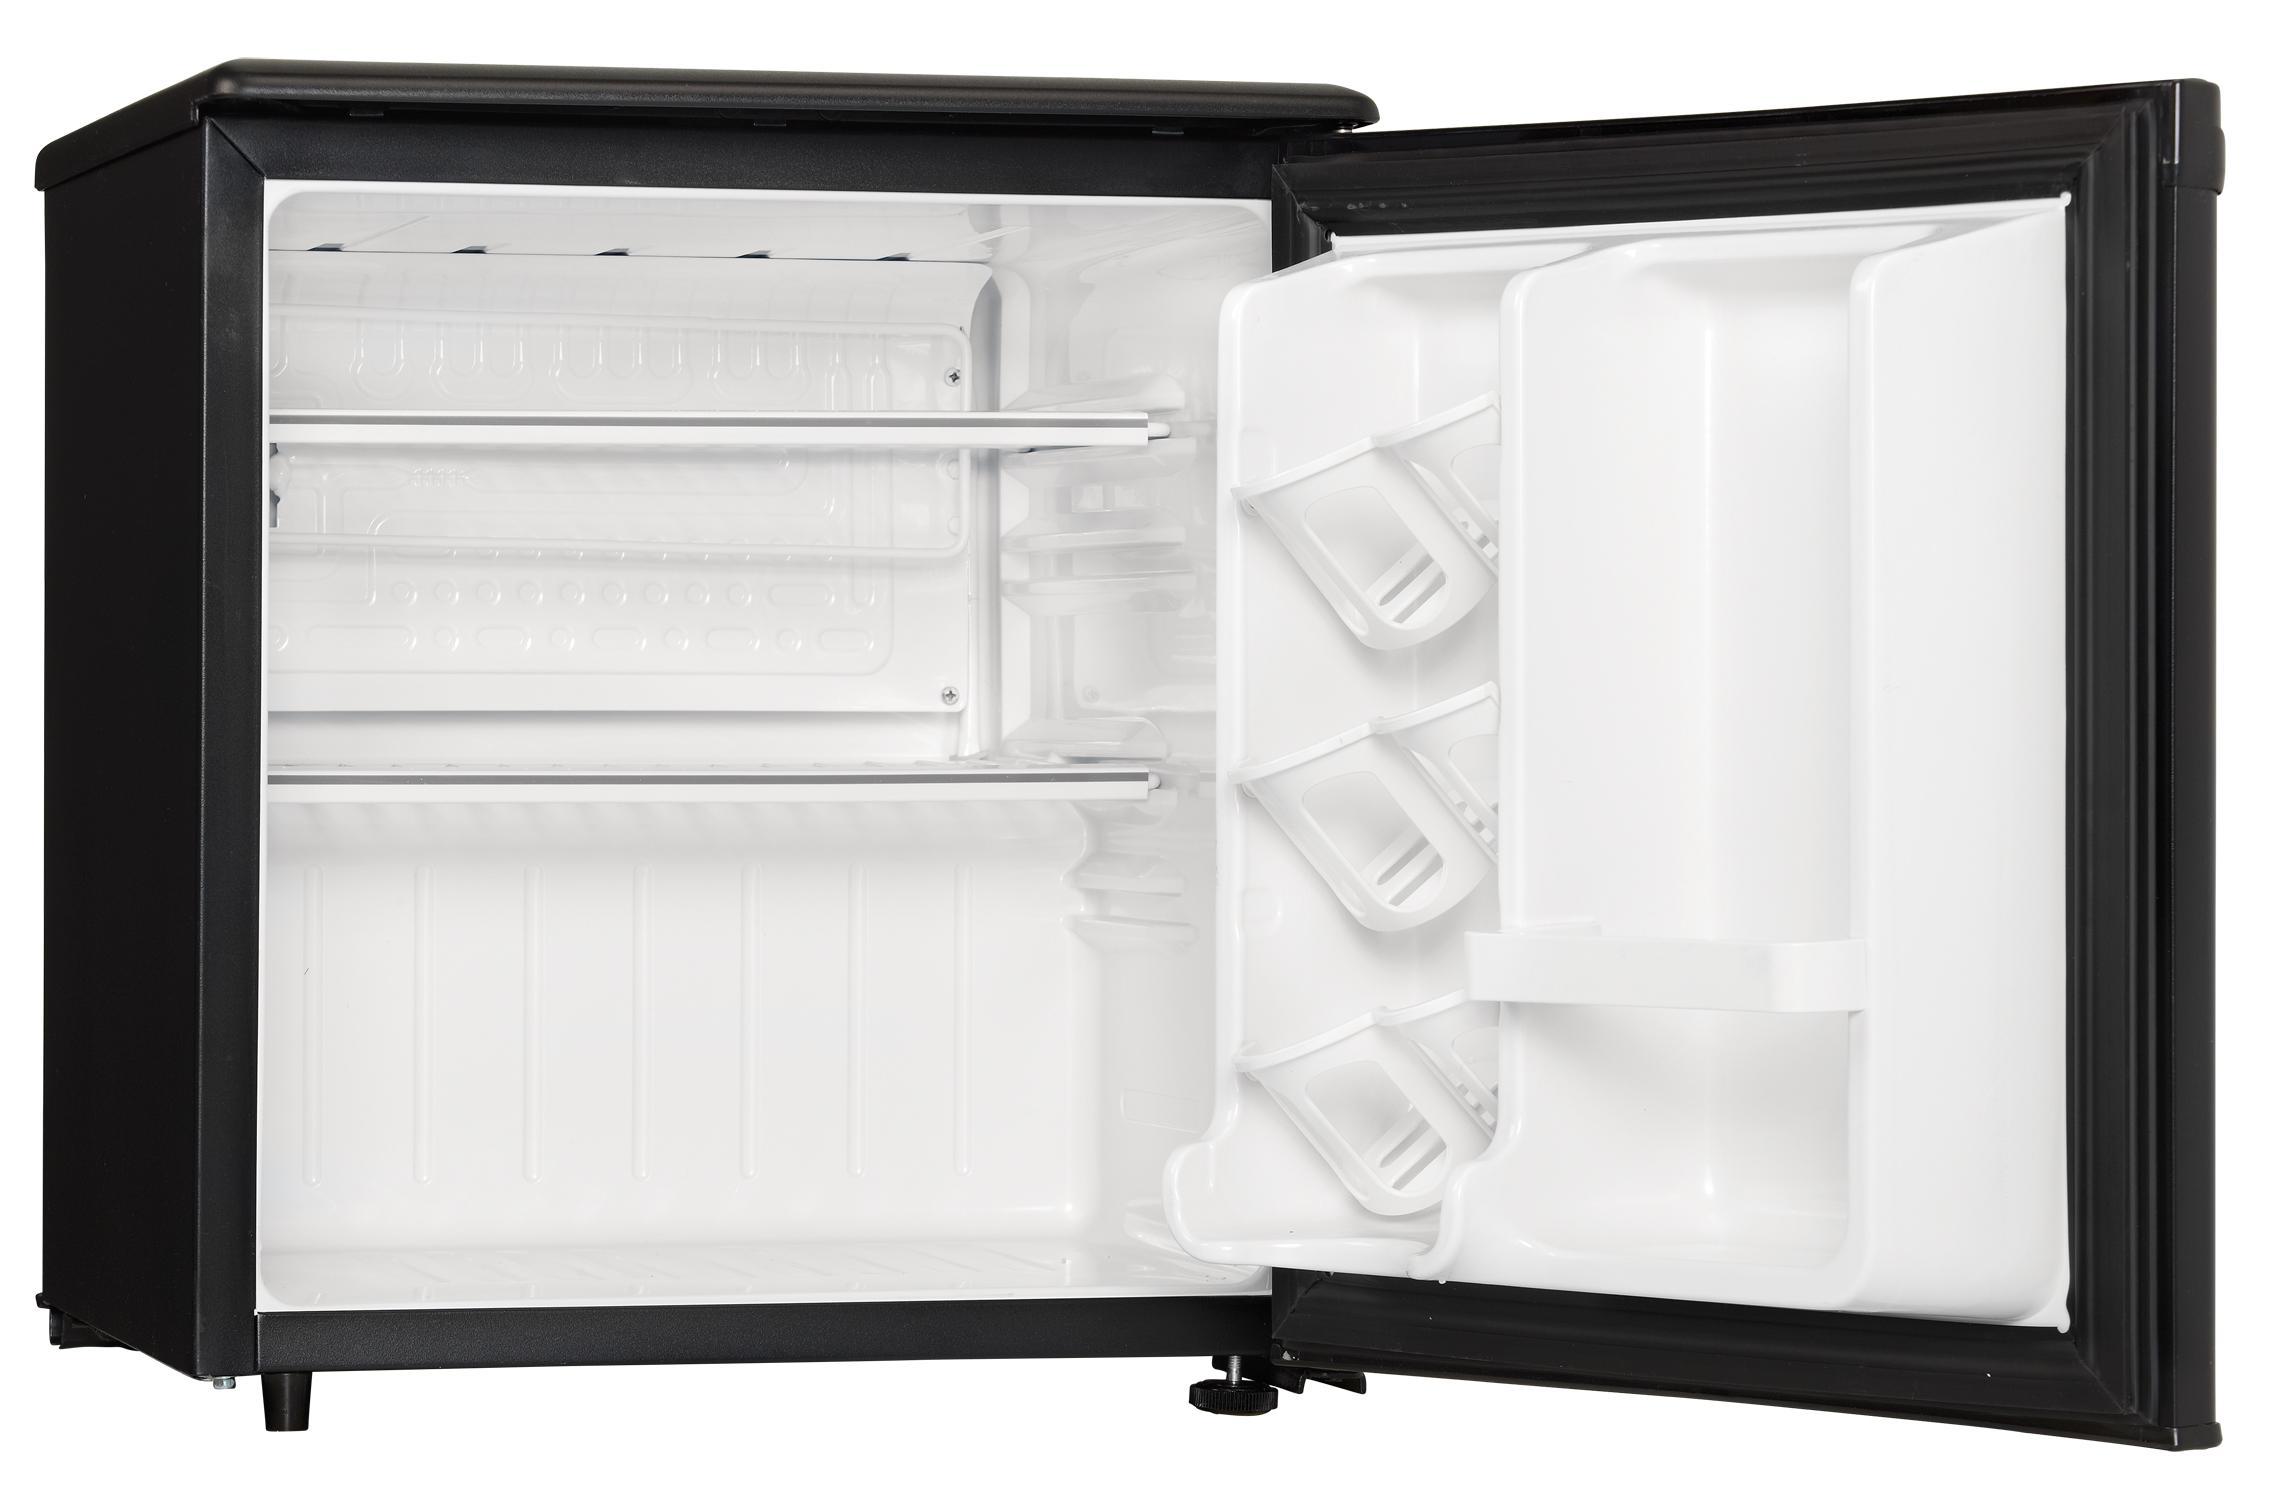 Compact Fridge For Dorm: NEW Danby 1 Dar017a2bdd Refrigerator Black Compact All Cu